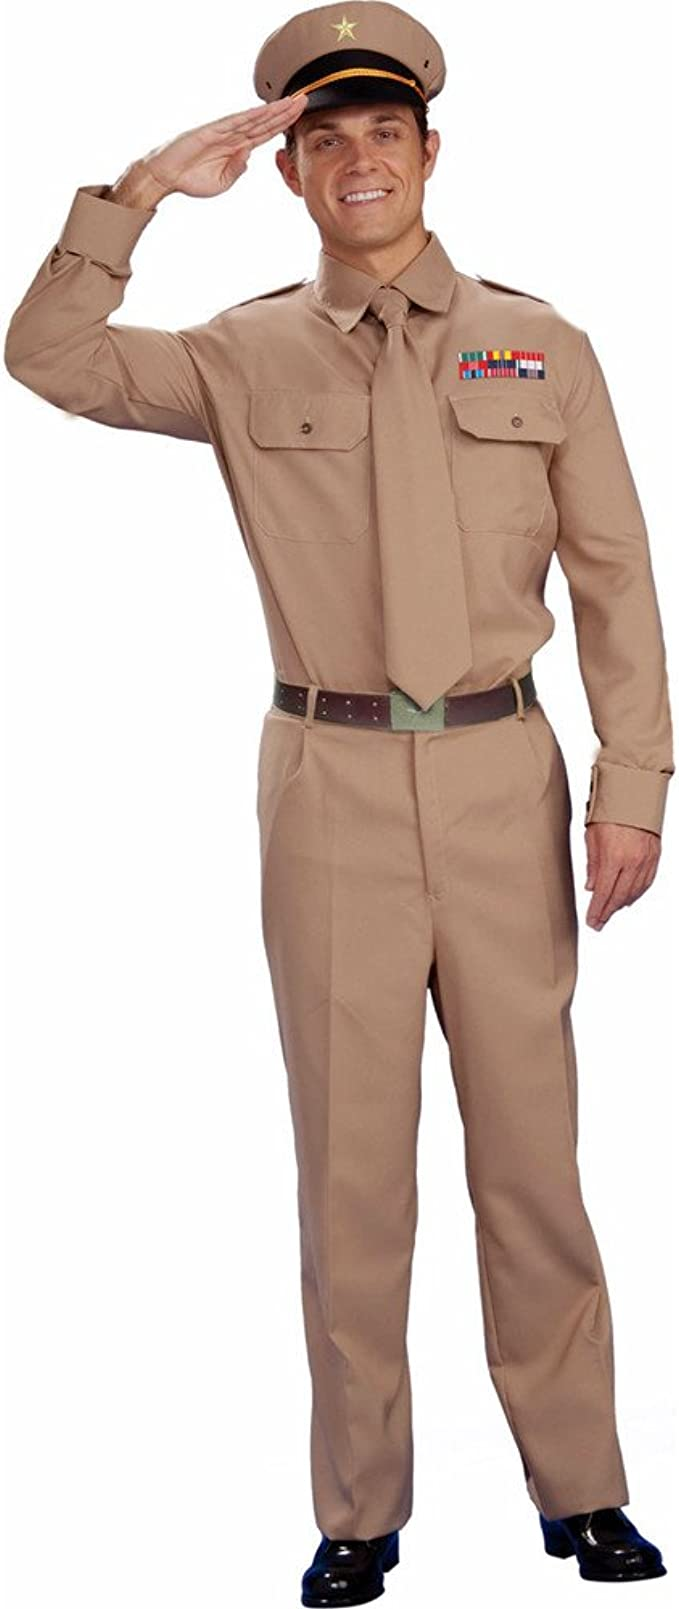 Military WW2 Army War General Adult Men Uniform Costume Pants Shirt Hat Tie Std